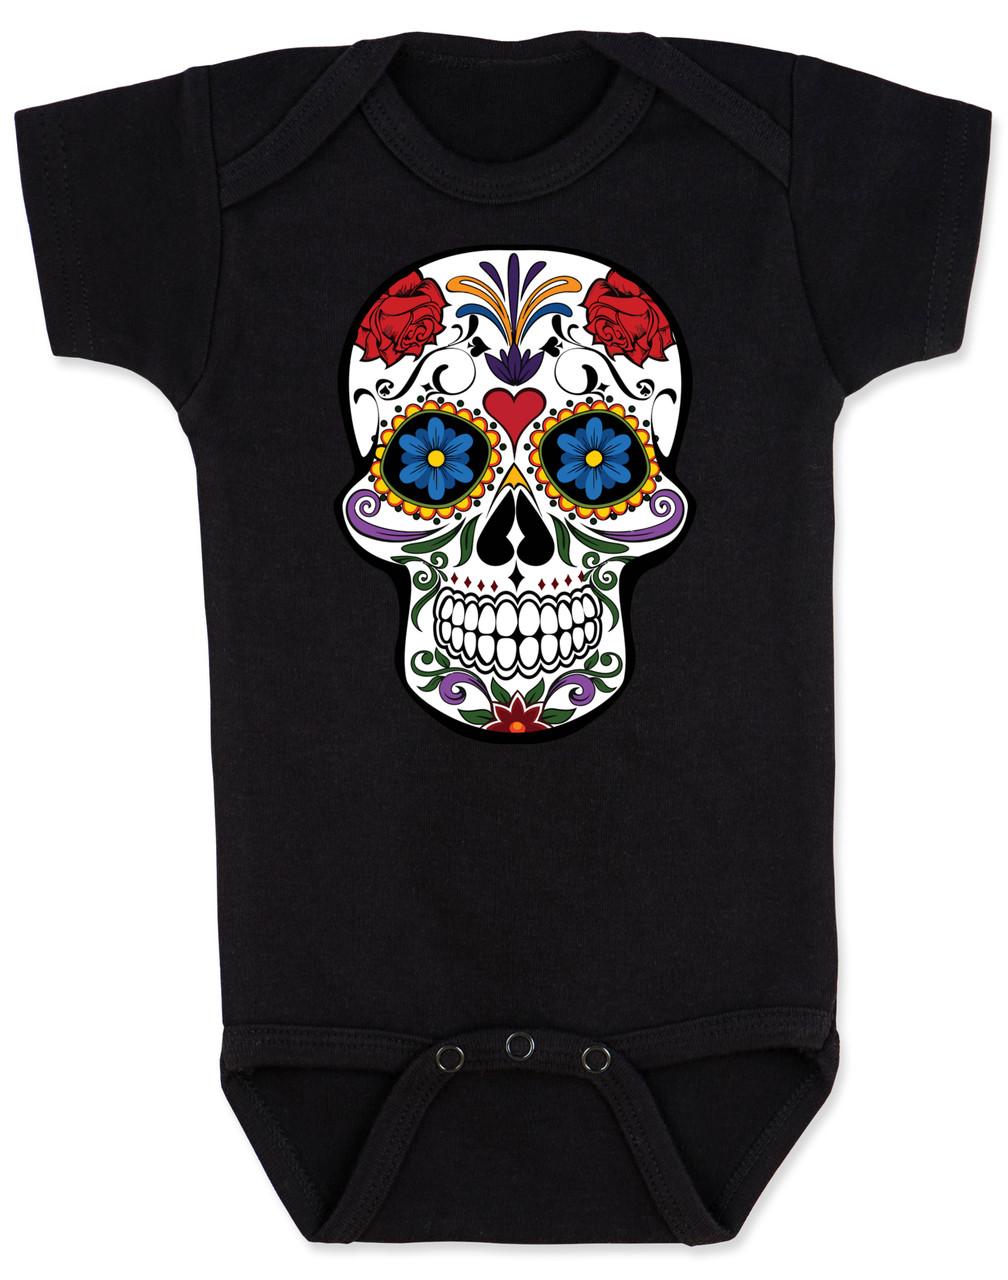 Psychedelic Sugar Skull Silhouette Printed Newborn Infant Baby Boy Girl Bodysuit Long Sleeve Rompers Black